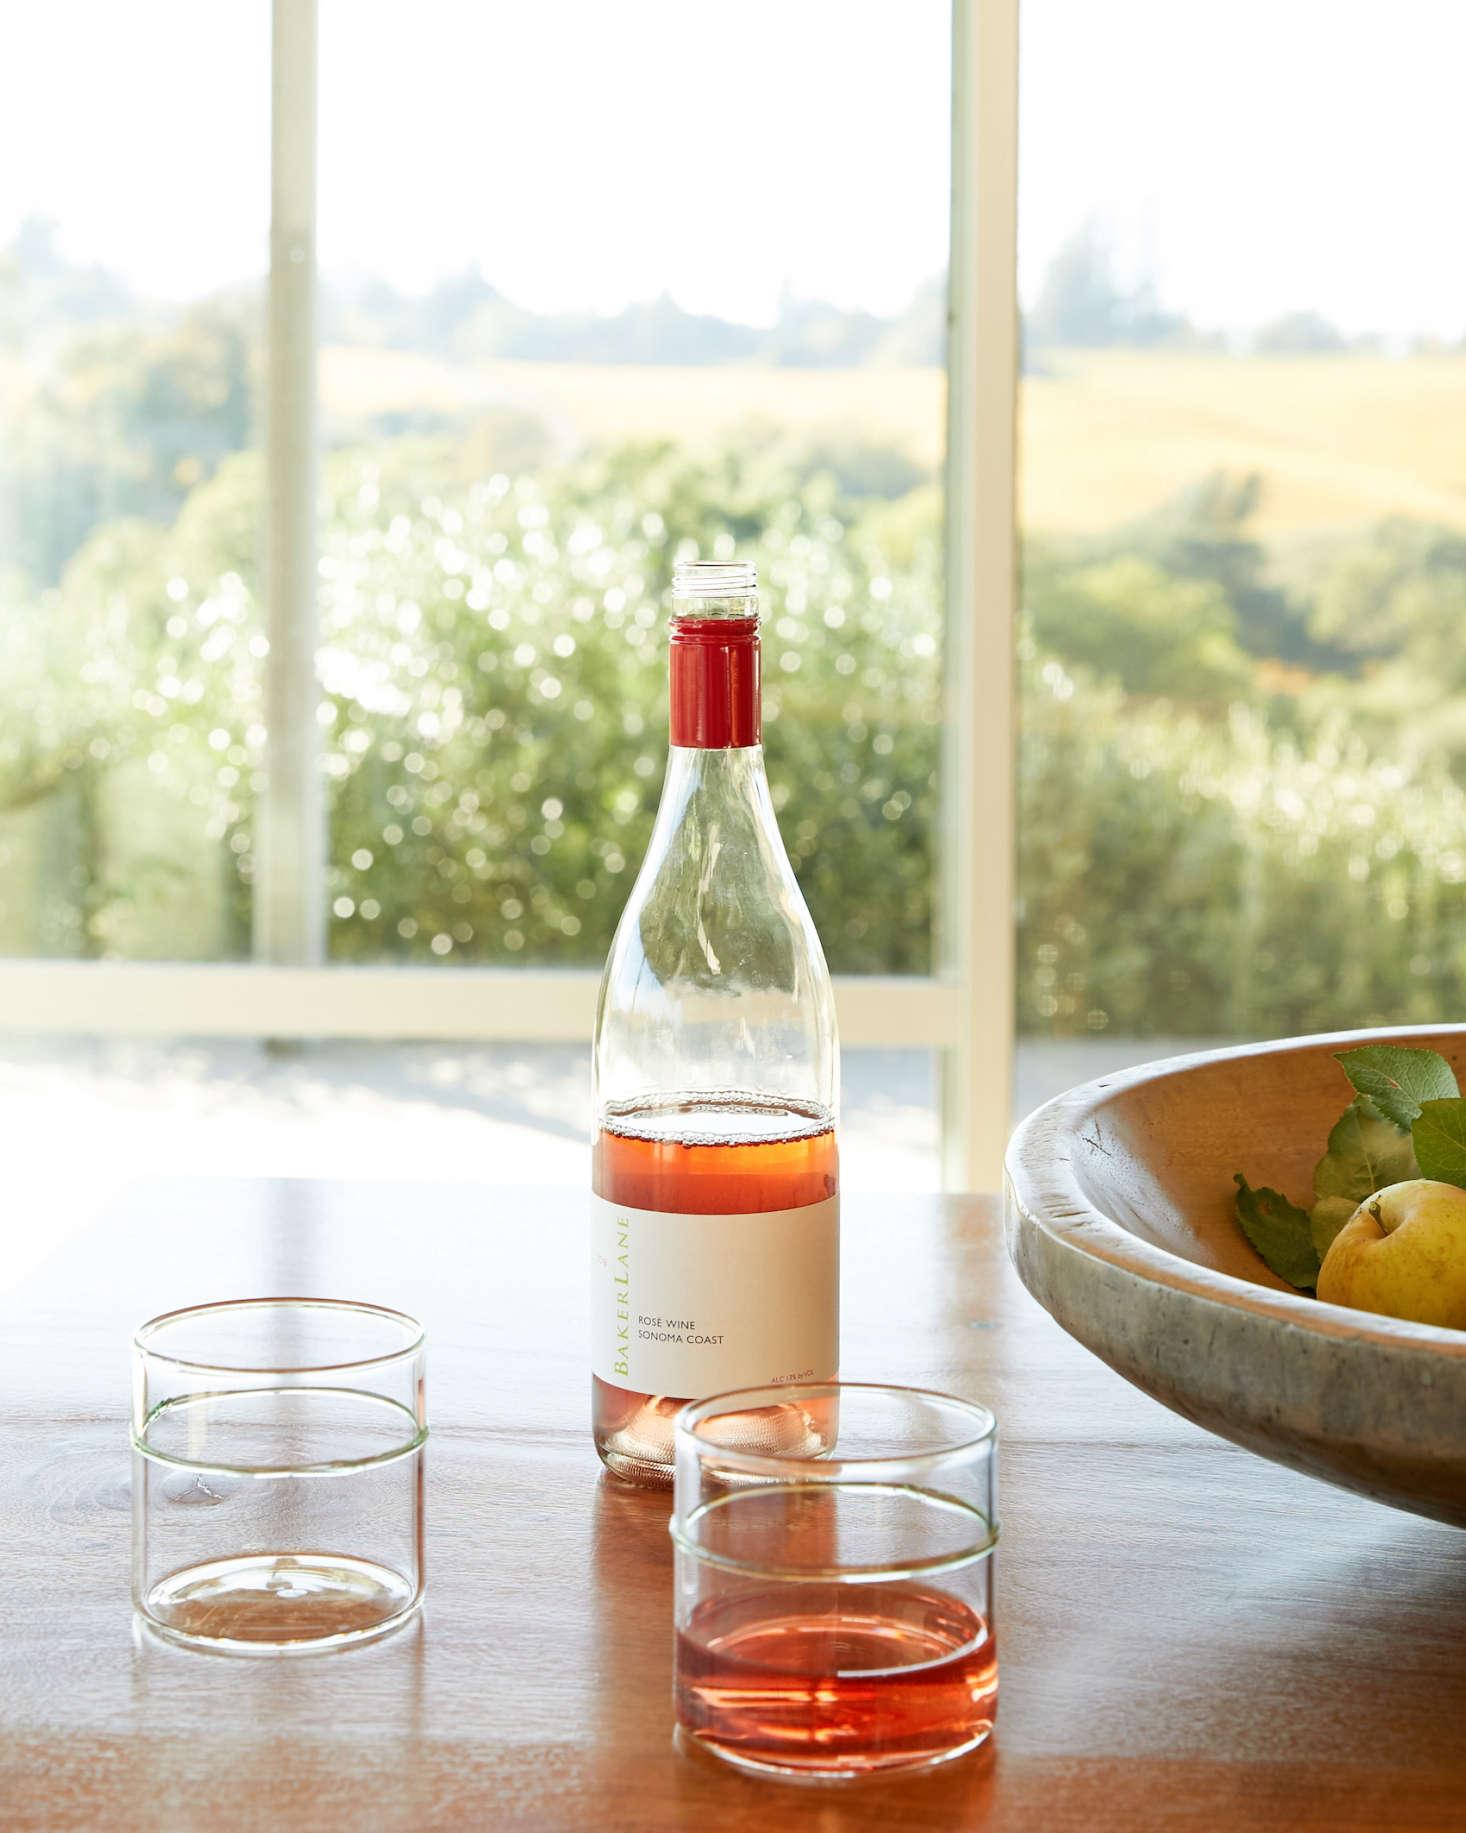 Baker Lane  Rosé ($),served in handblown ItalianAcqua e Vino glasses from Permanent Collection, of which Stephen Singer&#8